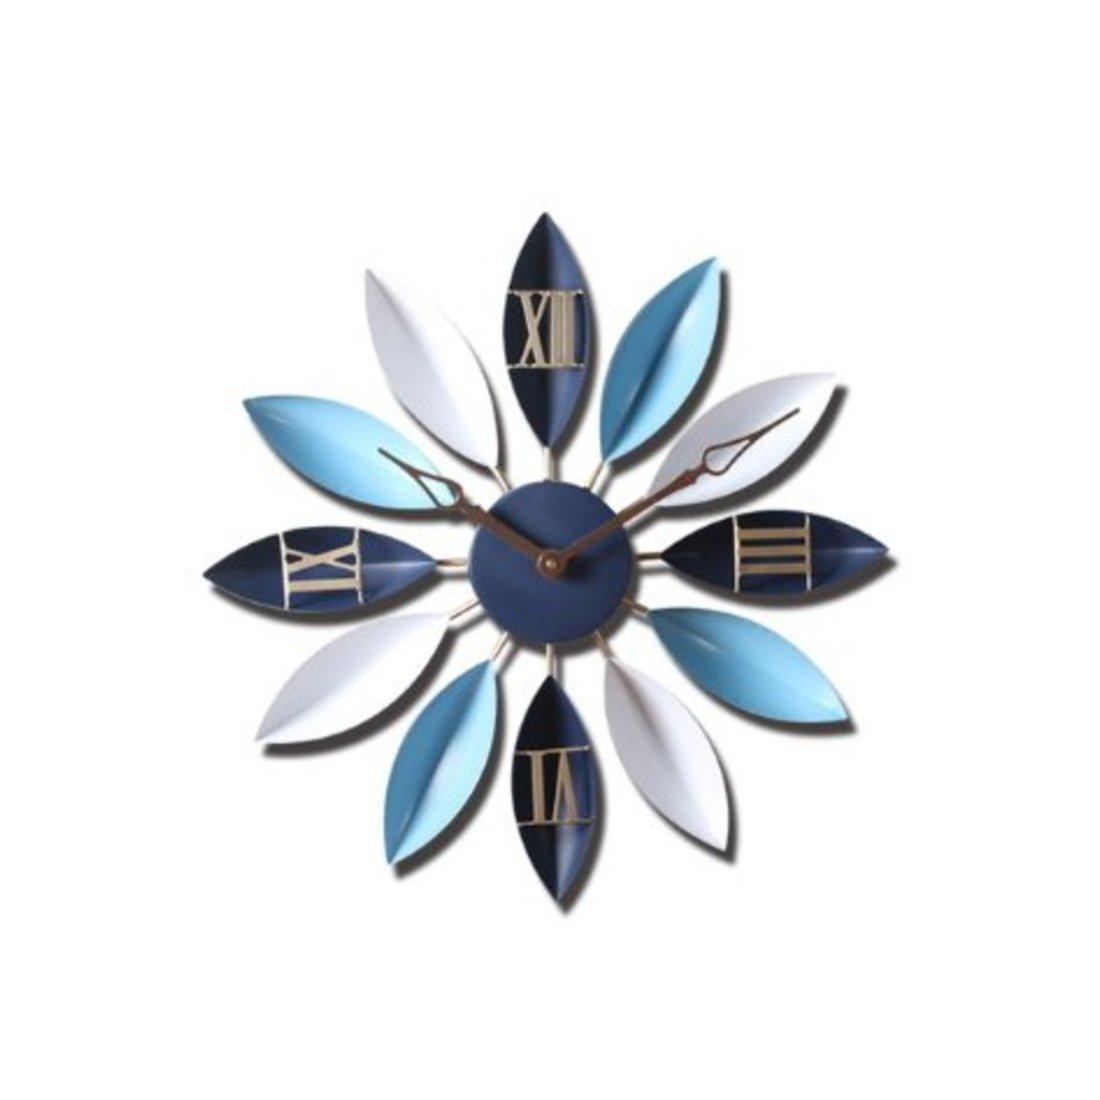 GREEM MARKET(グリームマーケット) ウォール クロック 大 大きい モダン おしゃれ モダン 葉 リーフ デザイン 金属 メタル 壁掛け時計 掛け時計 品番:GMS00965(オーシャンブルー) B077Q7D9Z1 オーシャンブルー オーシャンブルー